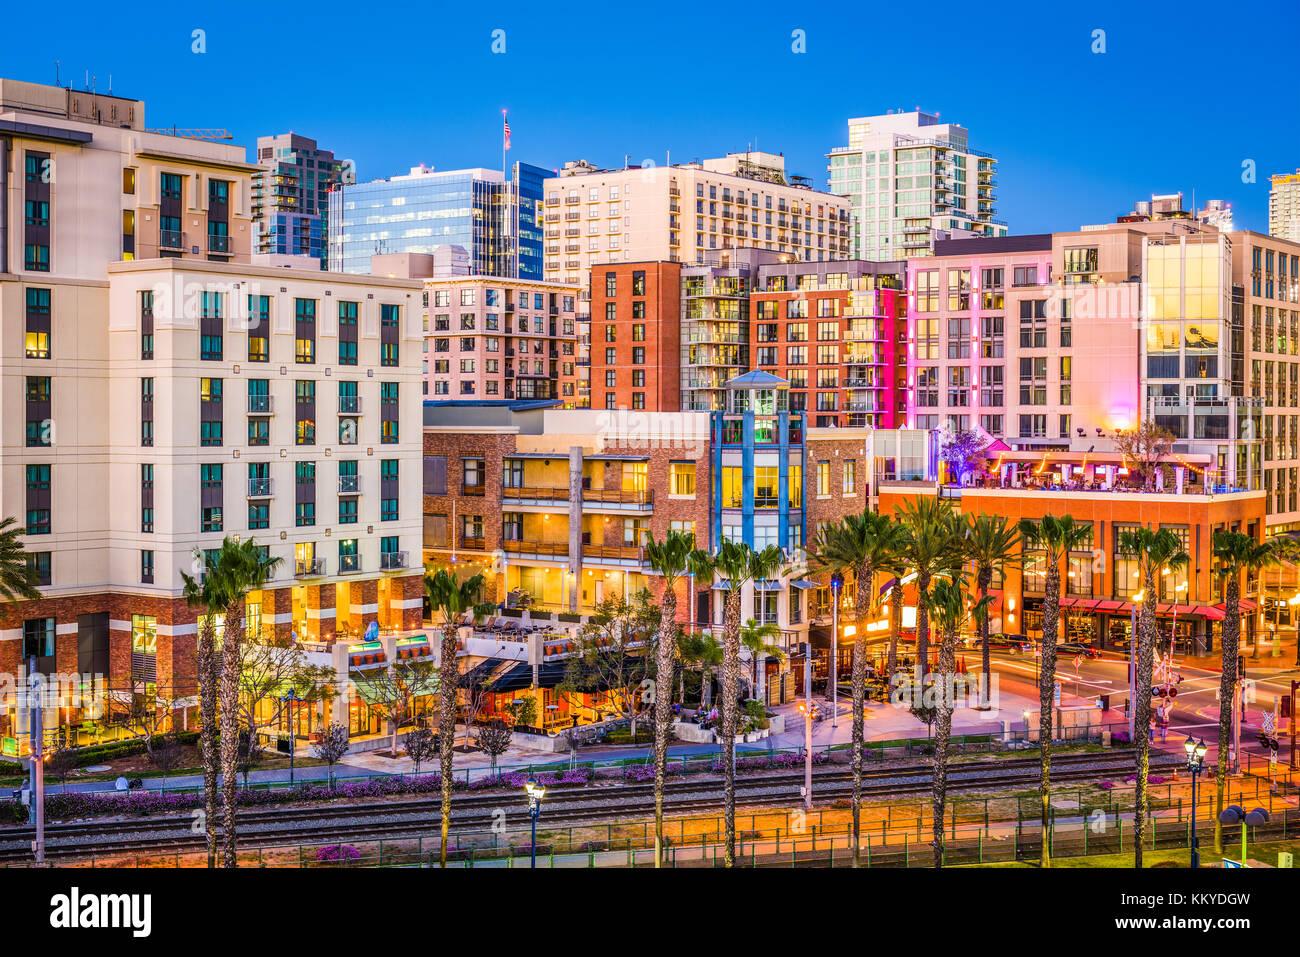 San Diego, California, USA cityscape at the Gaslamp Quarter. - Stock Image